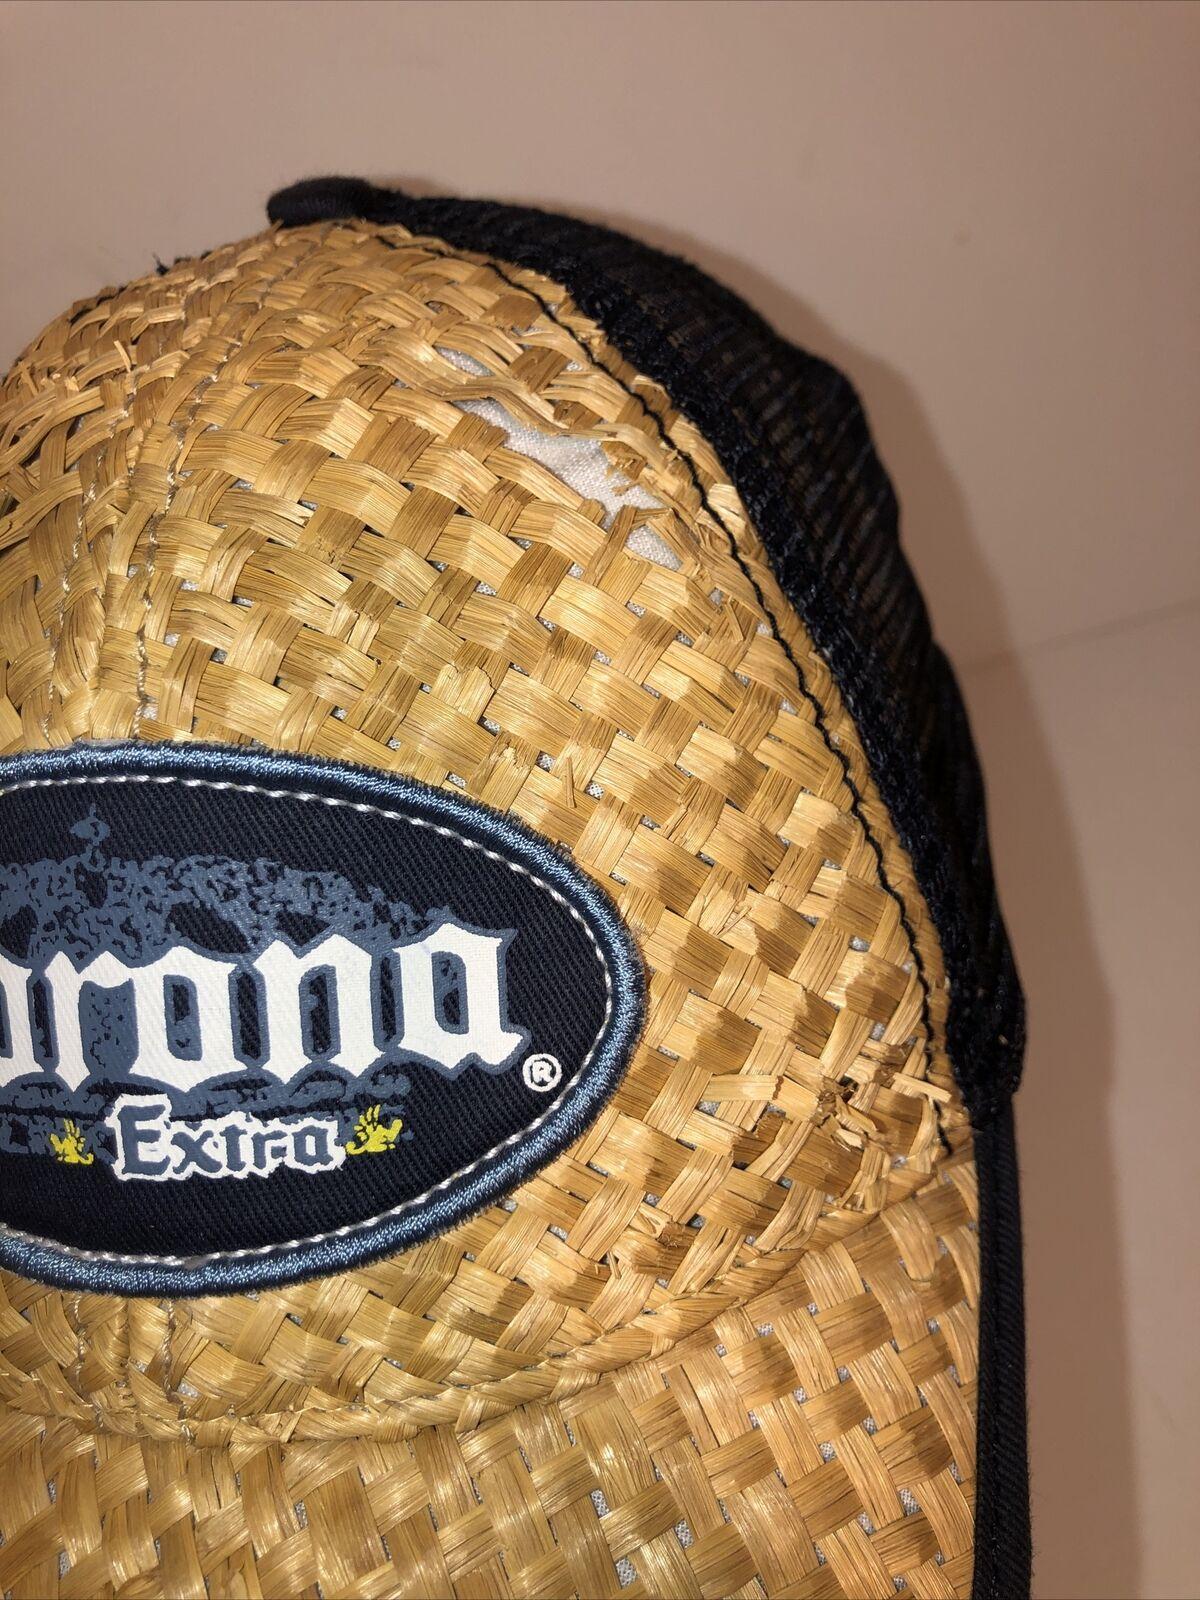 Vintage Corona Extra Beer Straw Woven Beach Cap H… - image 7